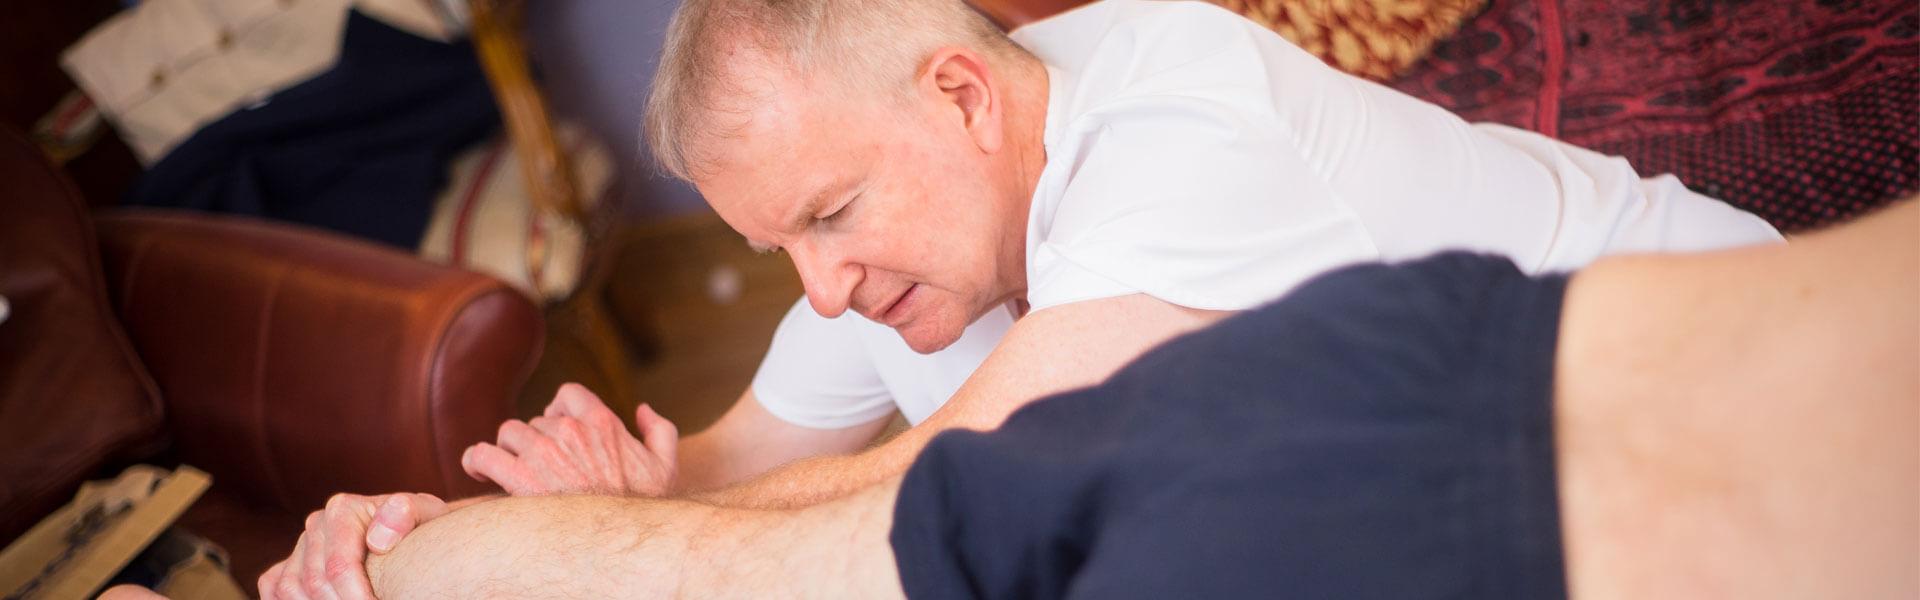 Slider image showing curative massage to leg